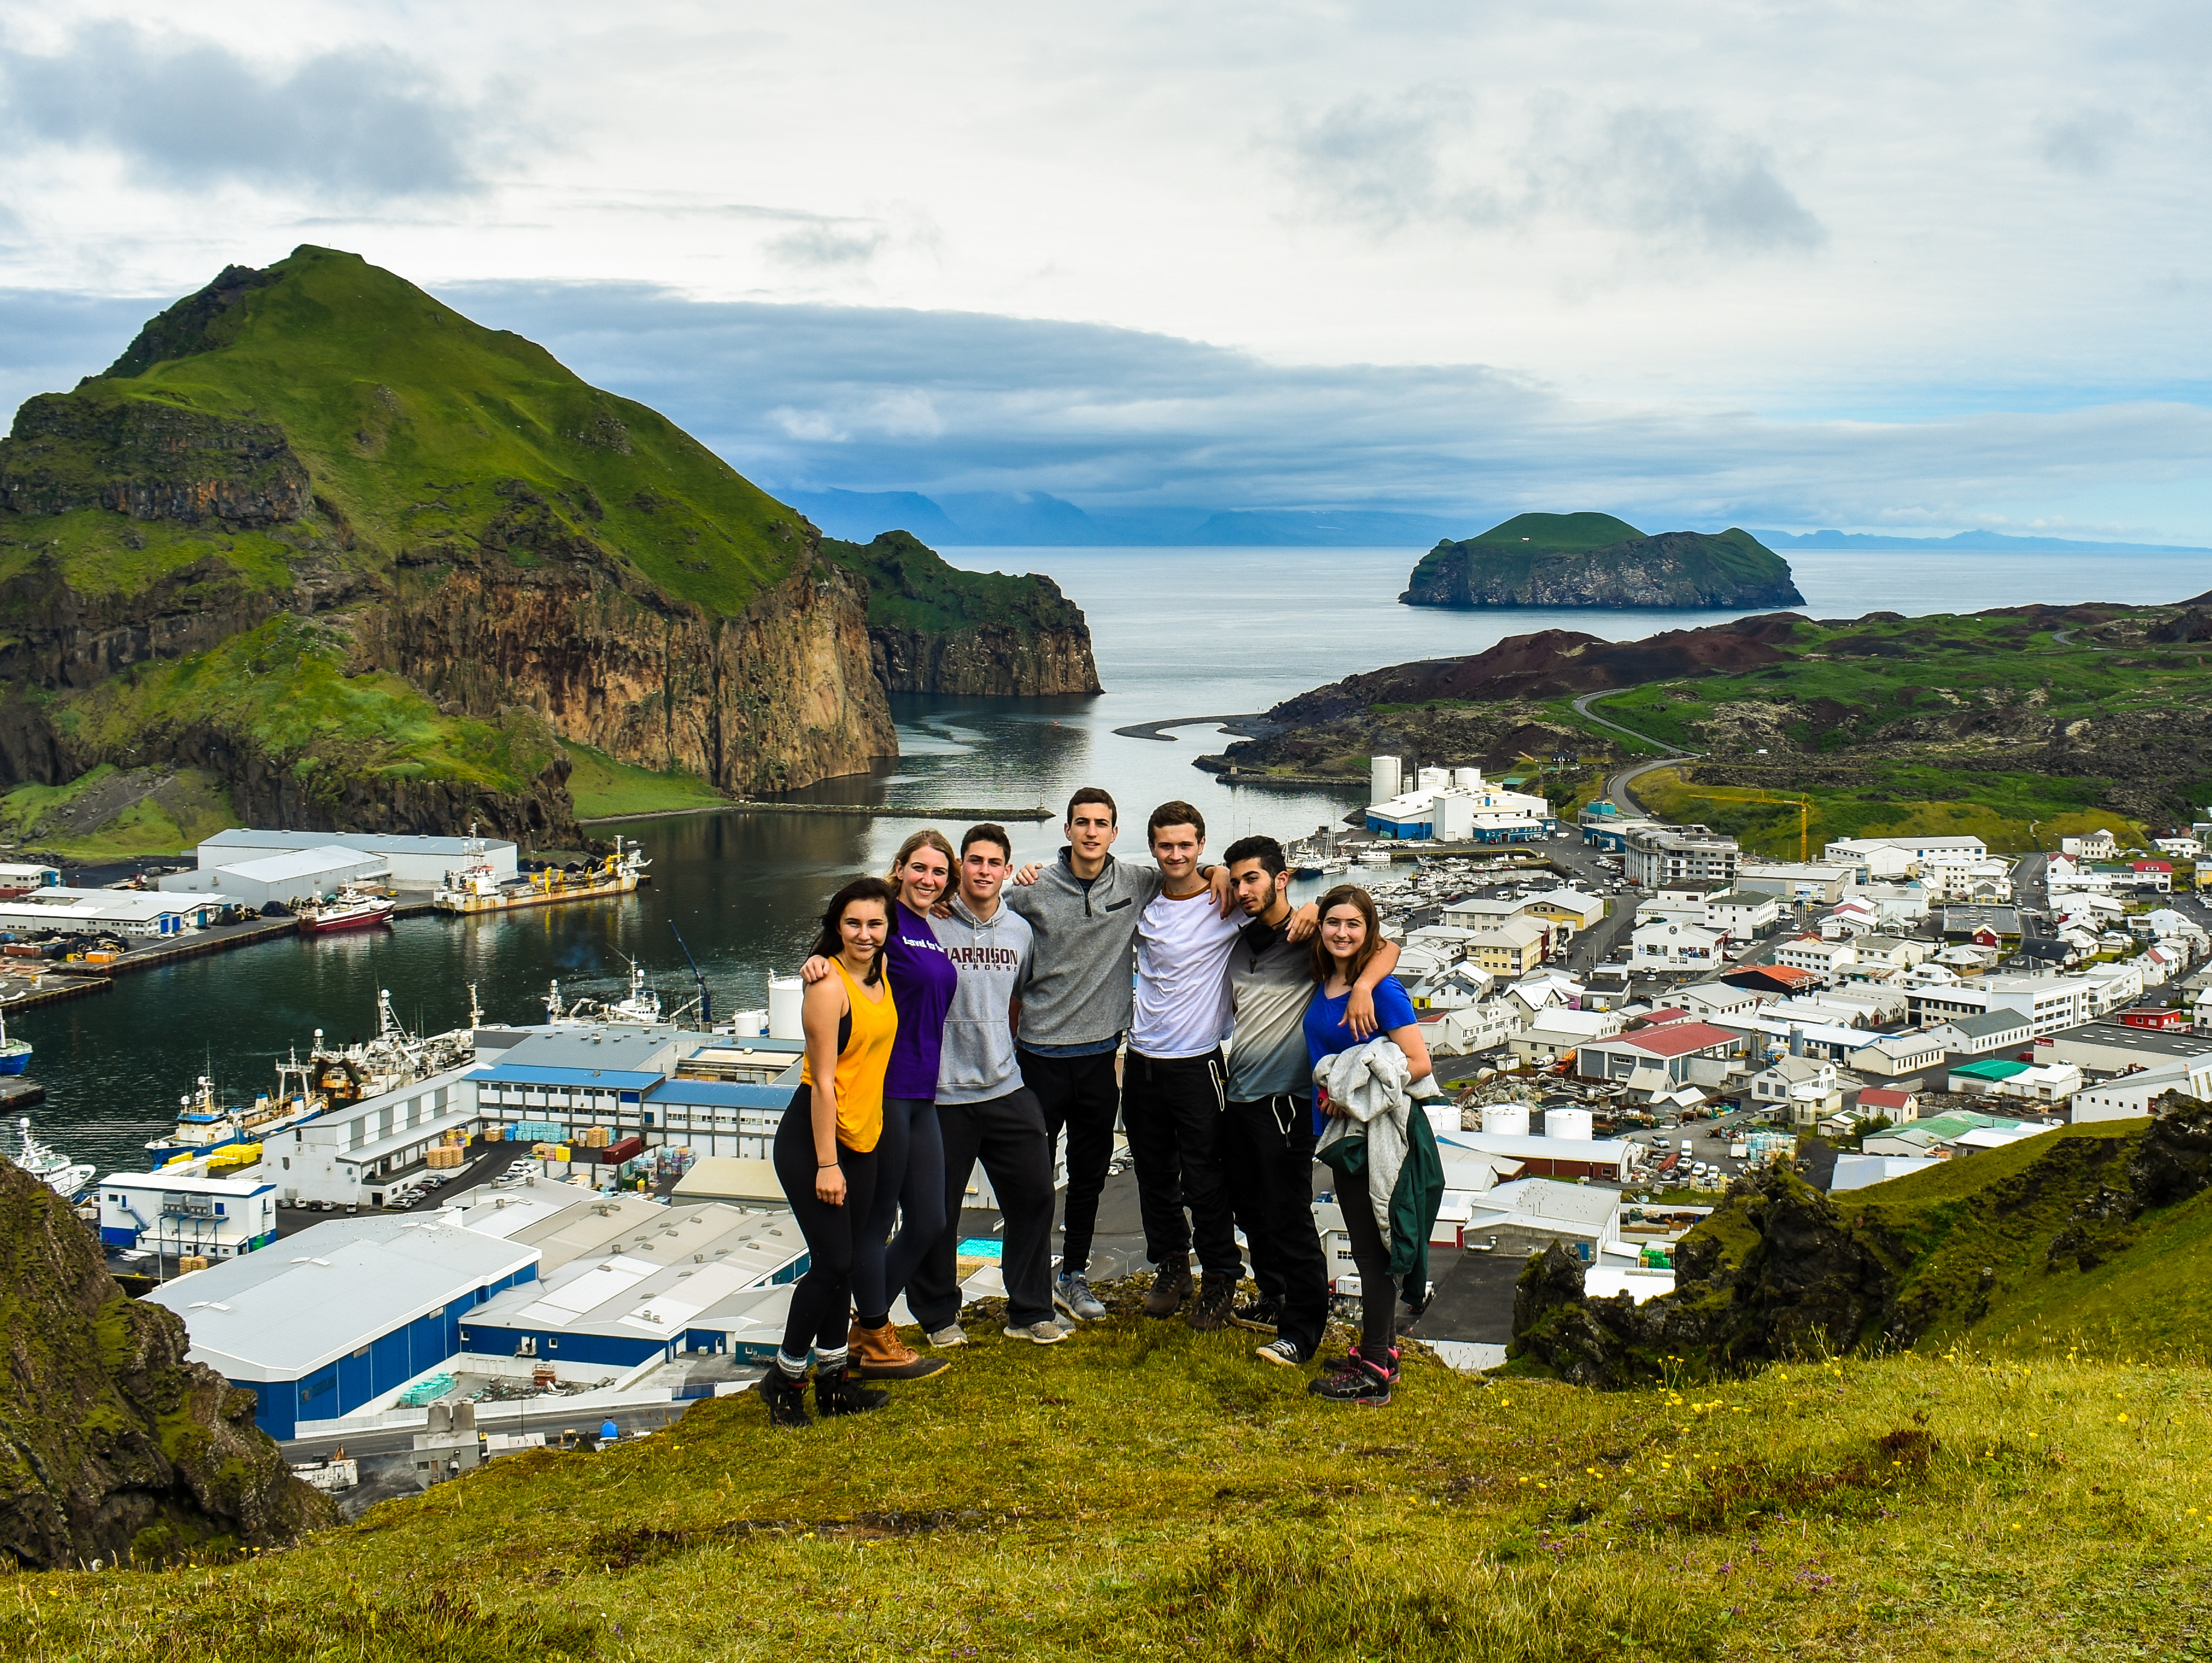 Summer Program - Adventure/Trips | Travel For Teens: Ultimate Nordic Adventure - Scandinavia and Iceland